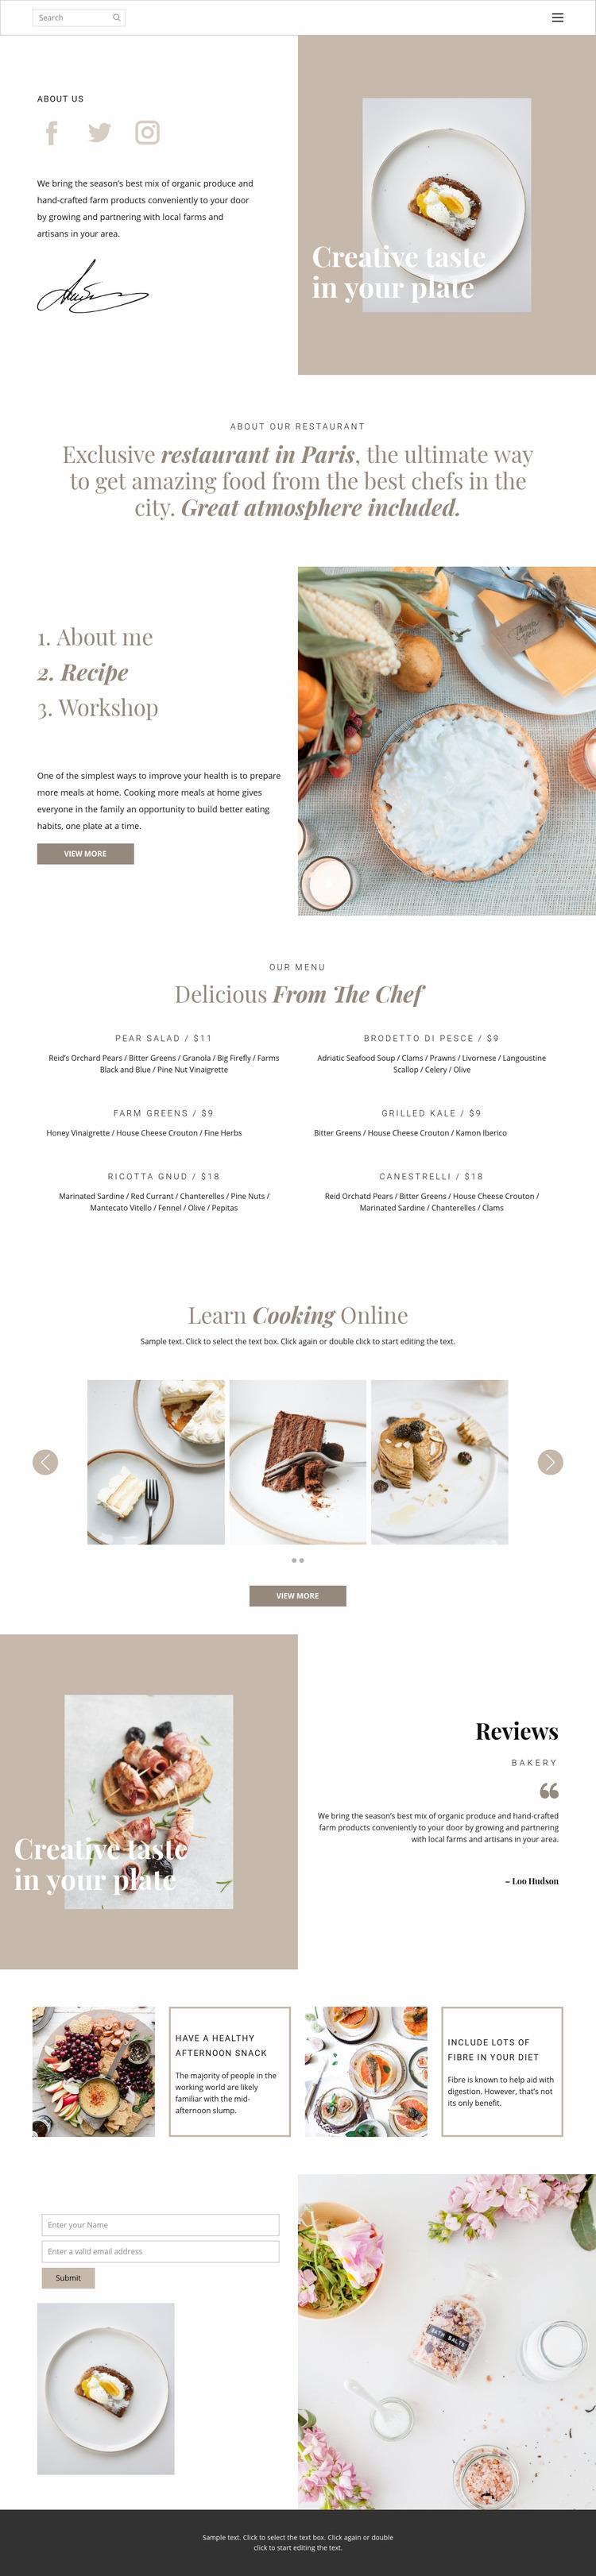 Creative taste in plate Website Maker